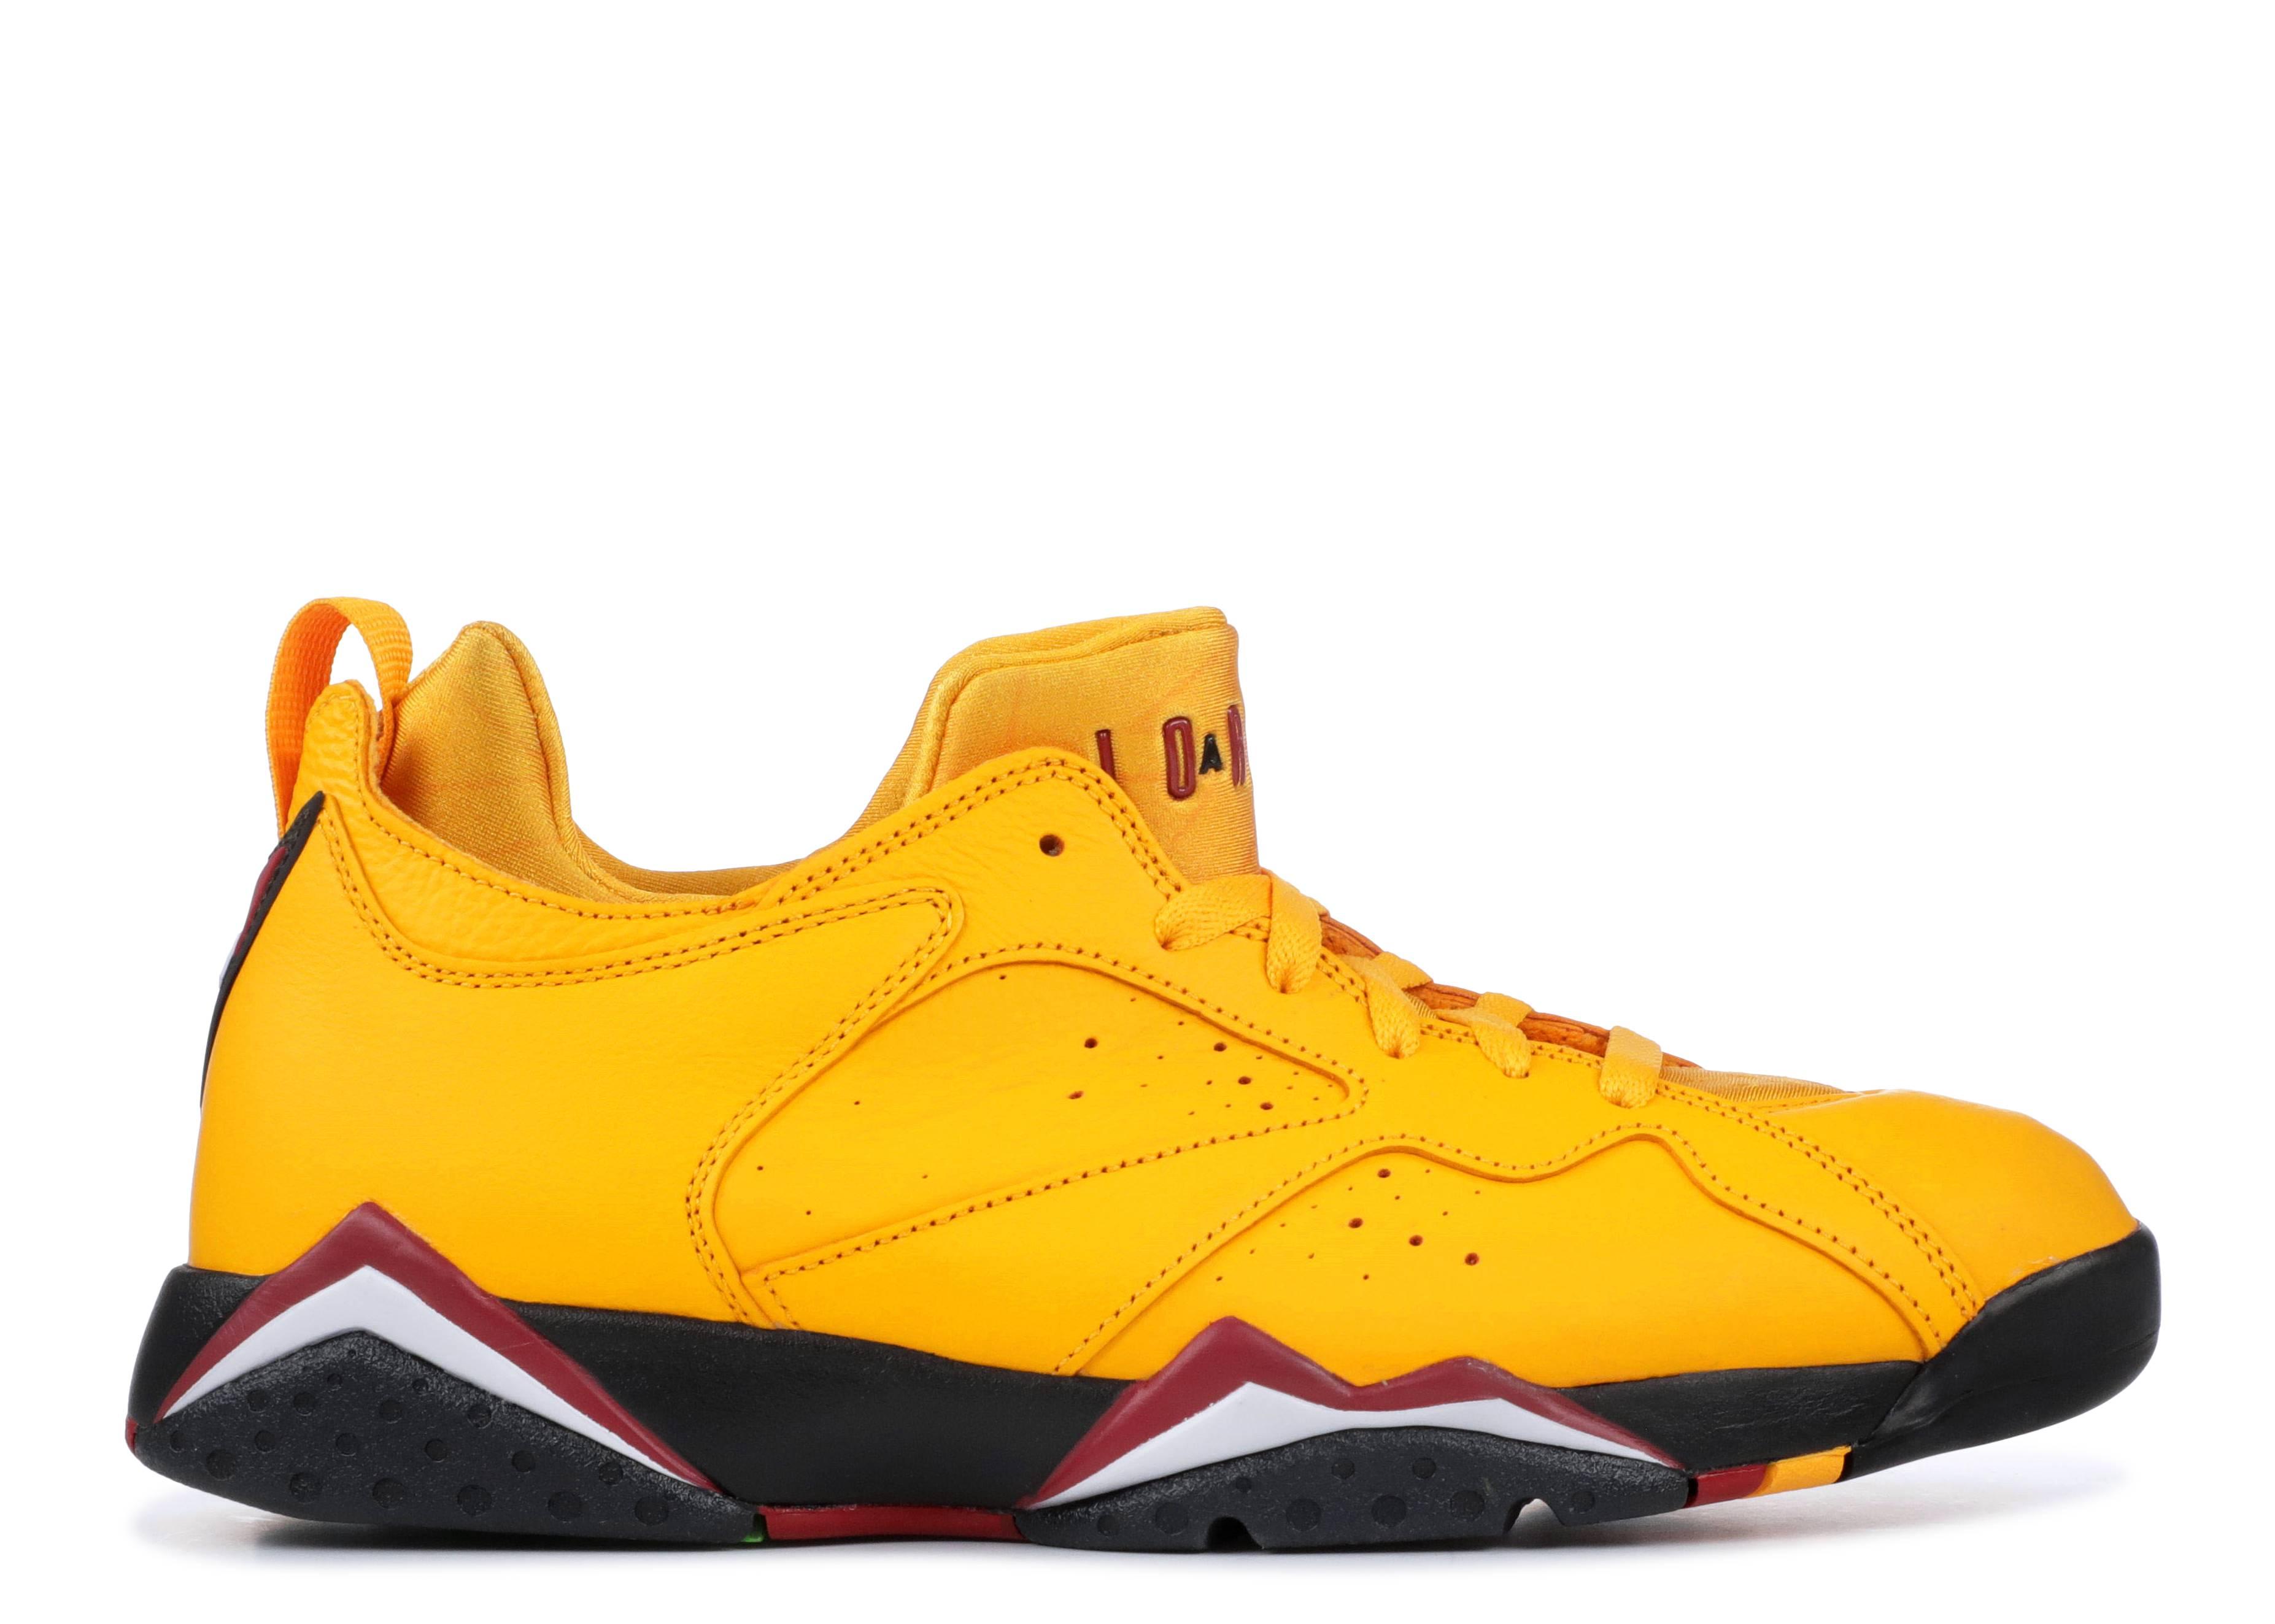 5b4d978312f Air Jordan 7 (VII) Shoes - Nike | Flight Club